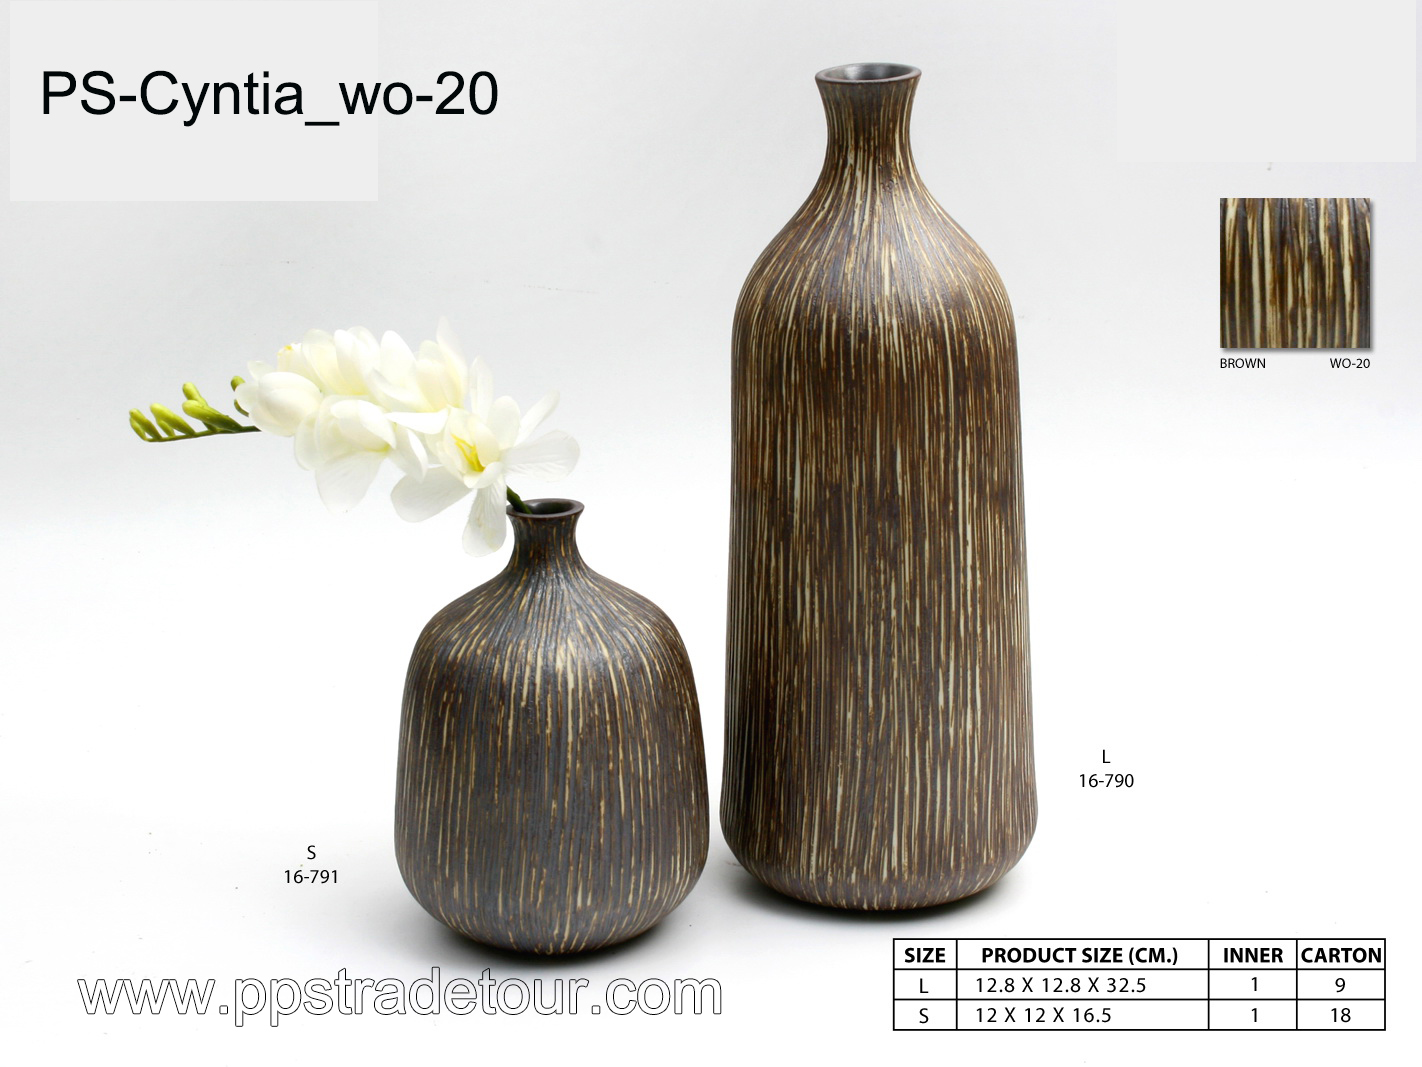 PSCV-Cyntia_wo-20